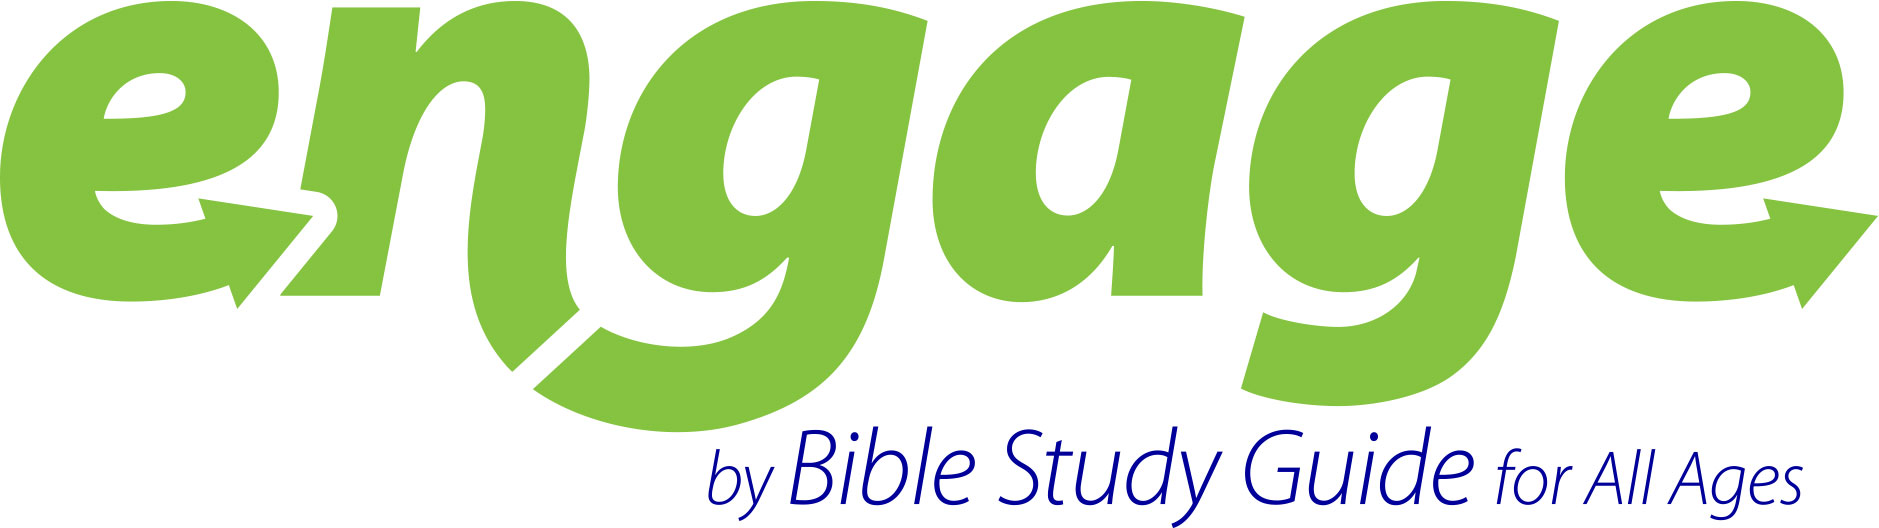 children's ministry bible curriculum